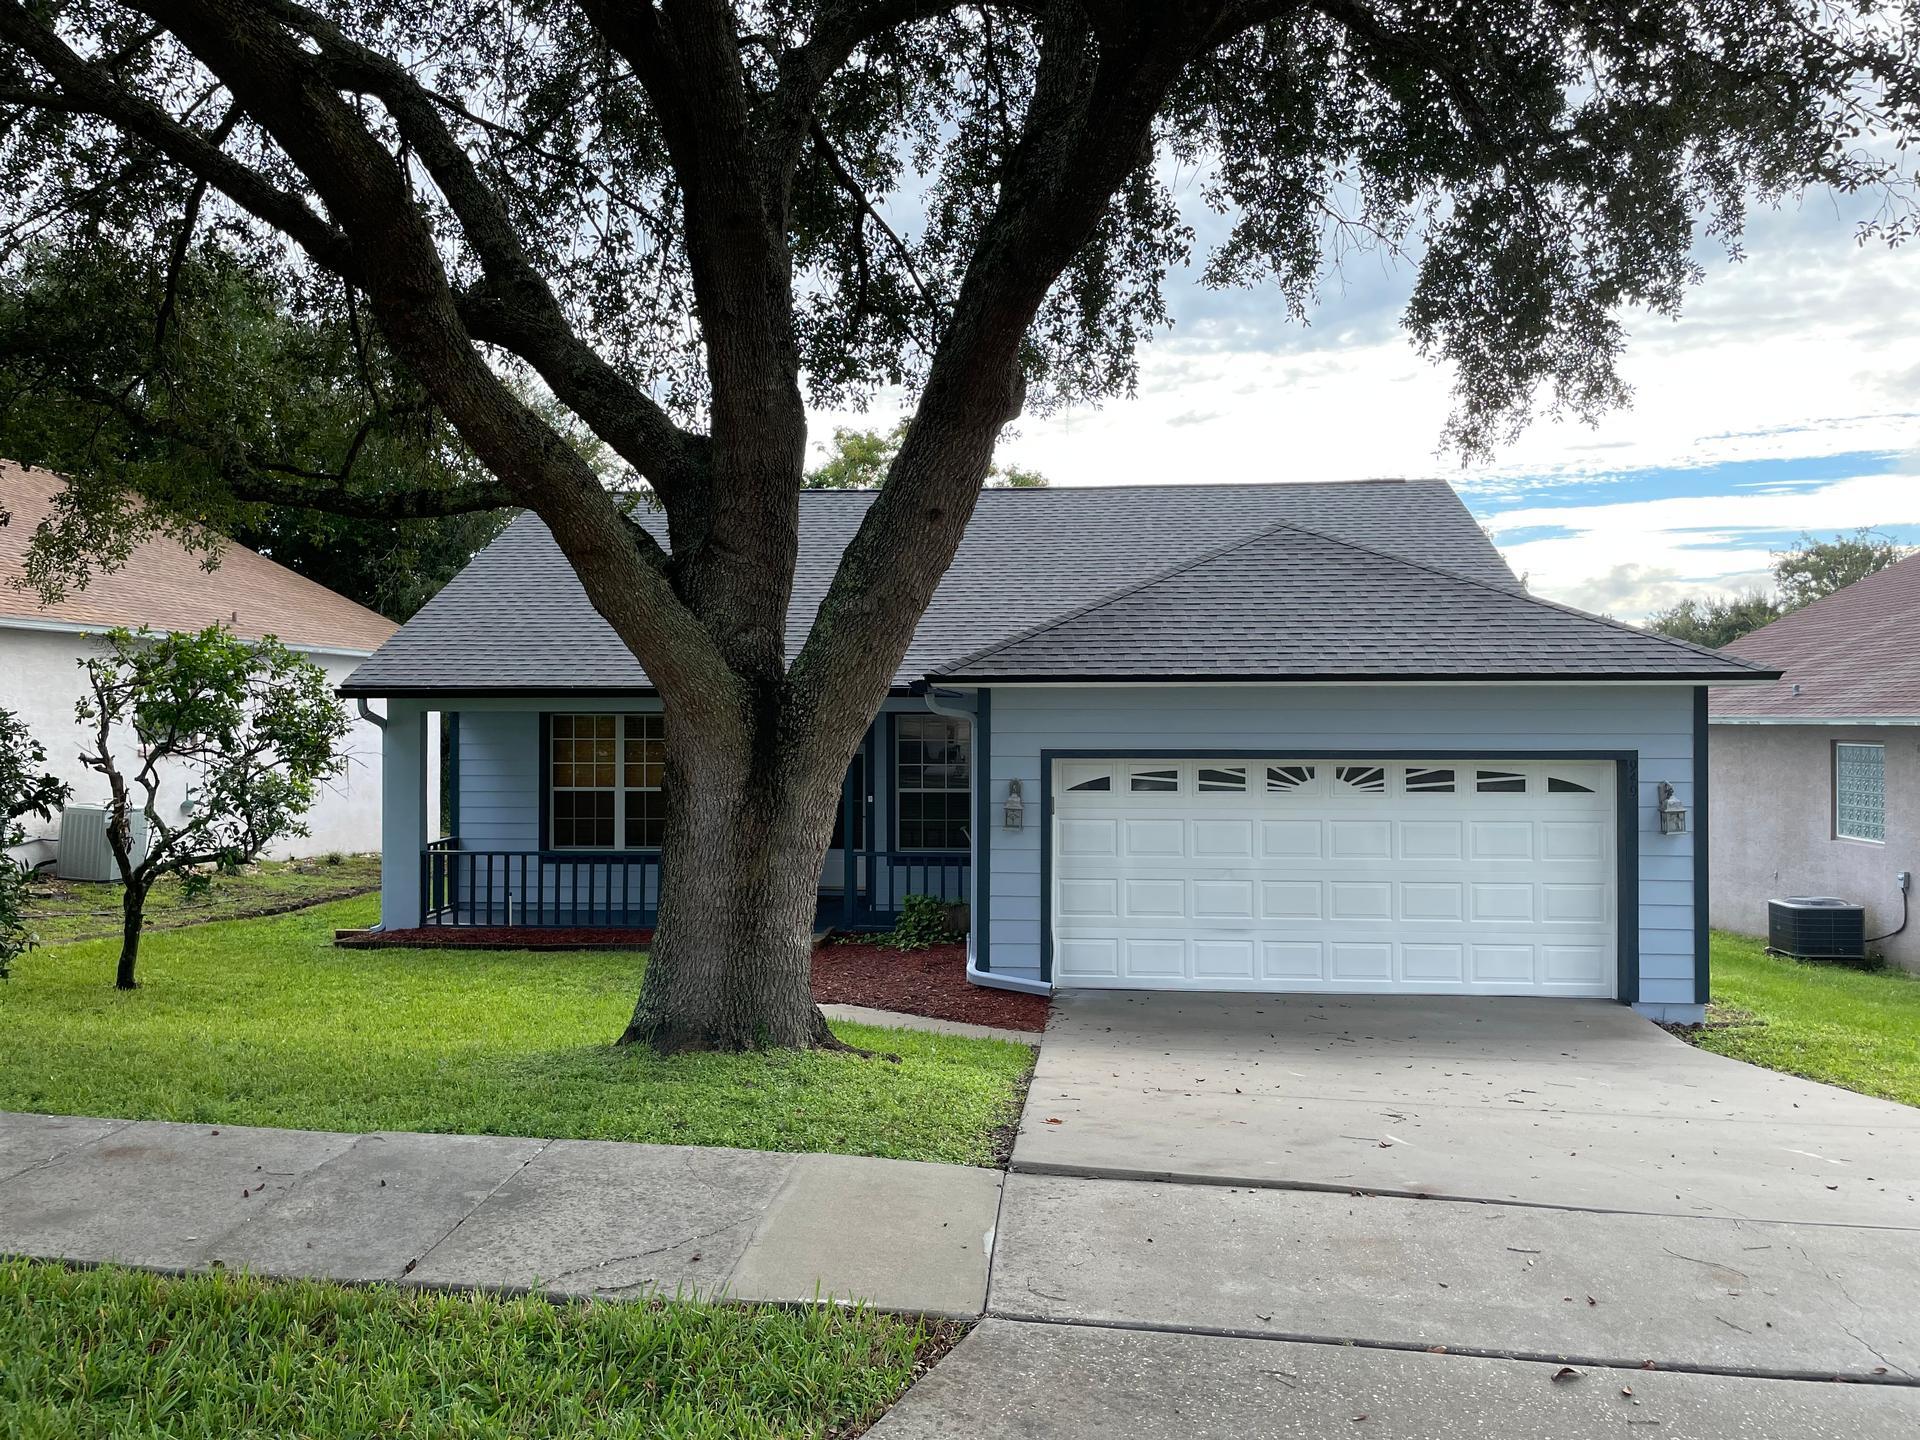 Photo of property: 949 Dekleva Drive Apopka, FL 32712